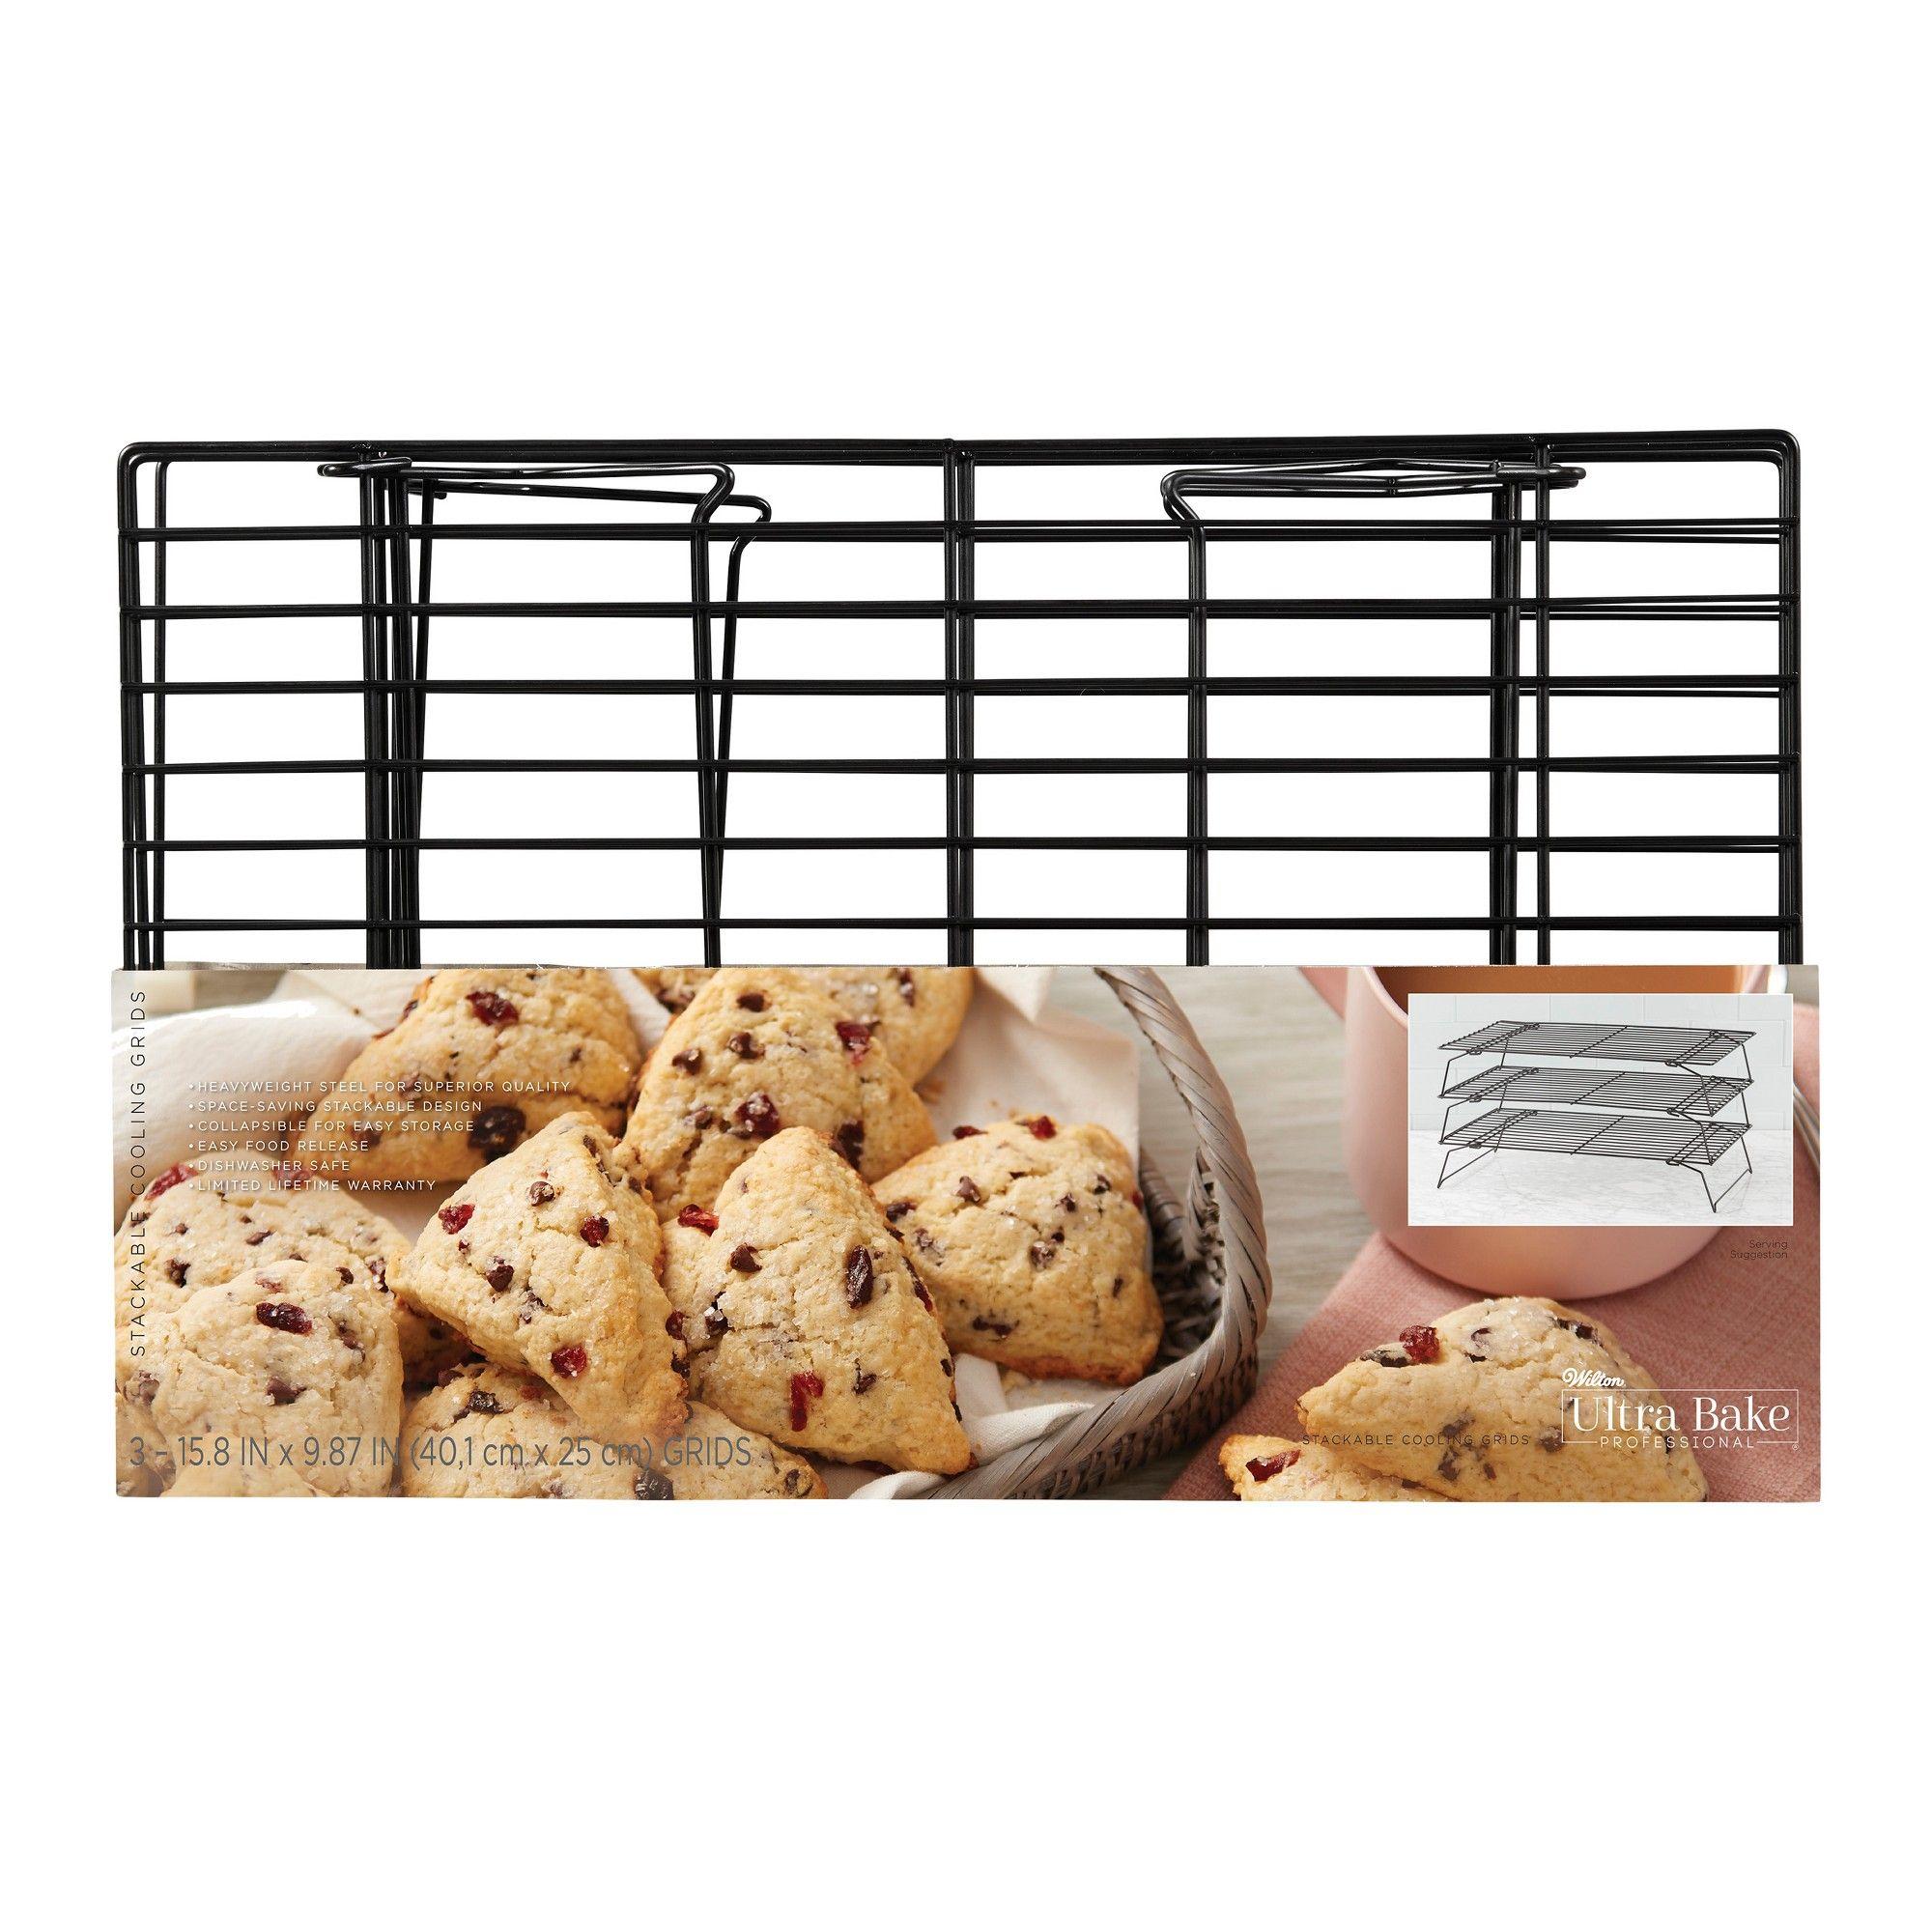 Wilton Ultra Bake Pro 3 Tier Cooling Rack Black Simple Storage